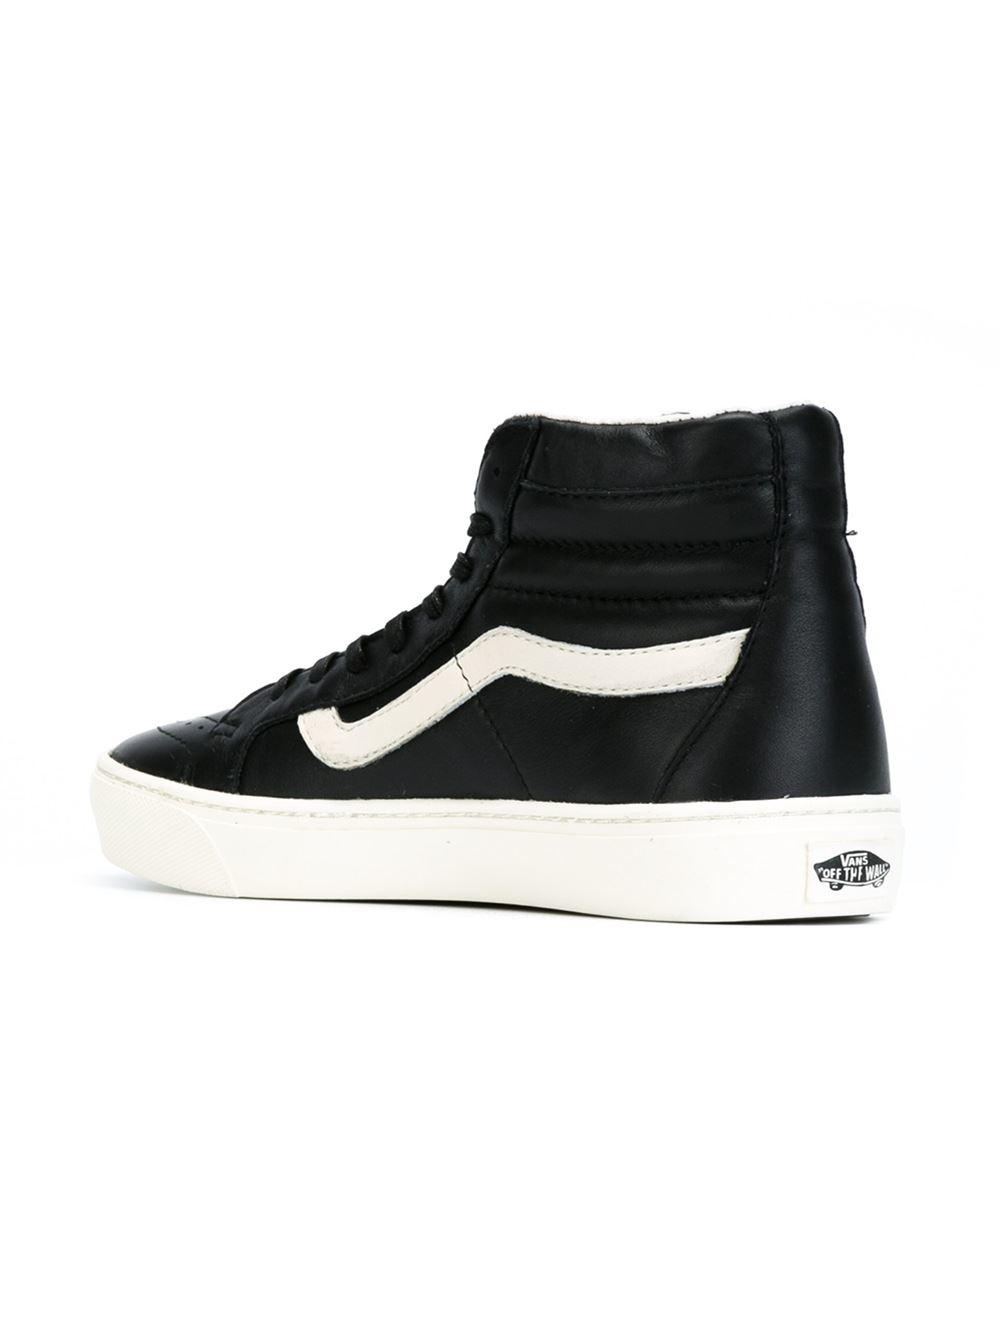 d86748e405 Lyst - Vans Leather Hi-top Sneakers in Black for Men